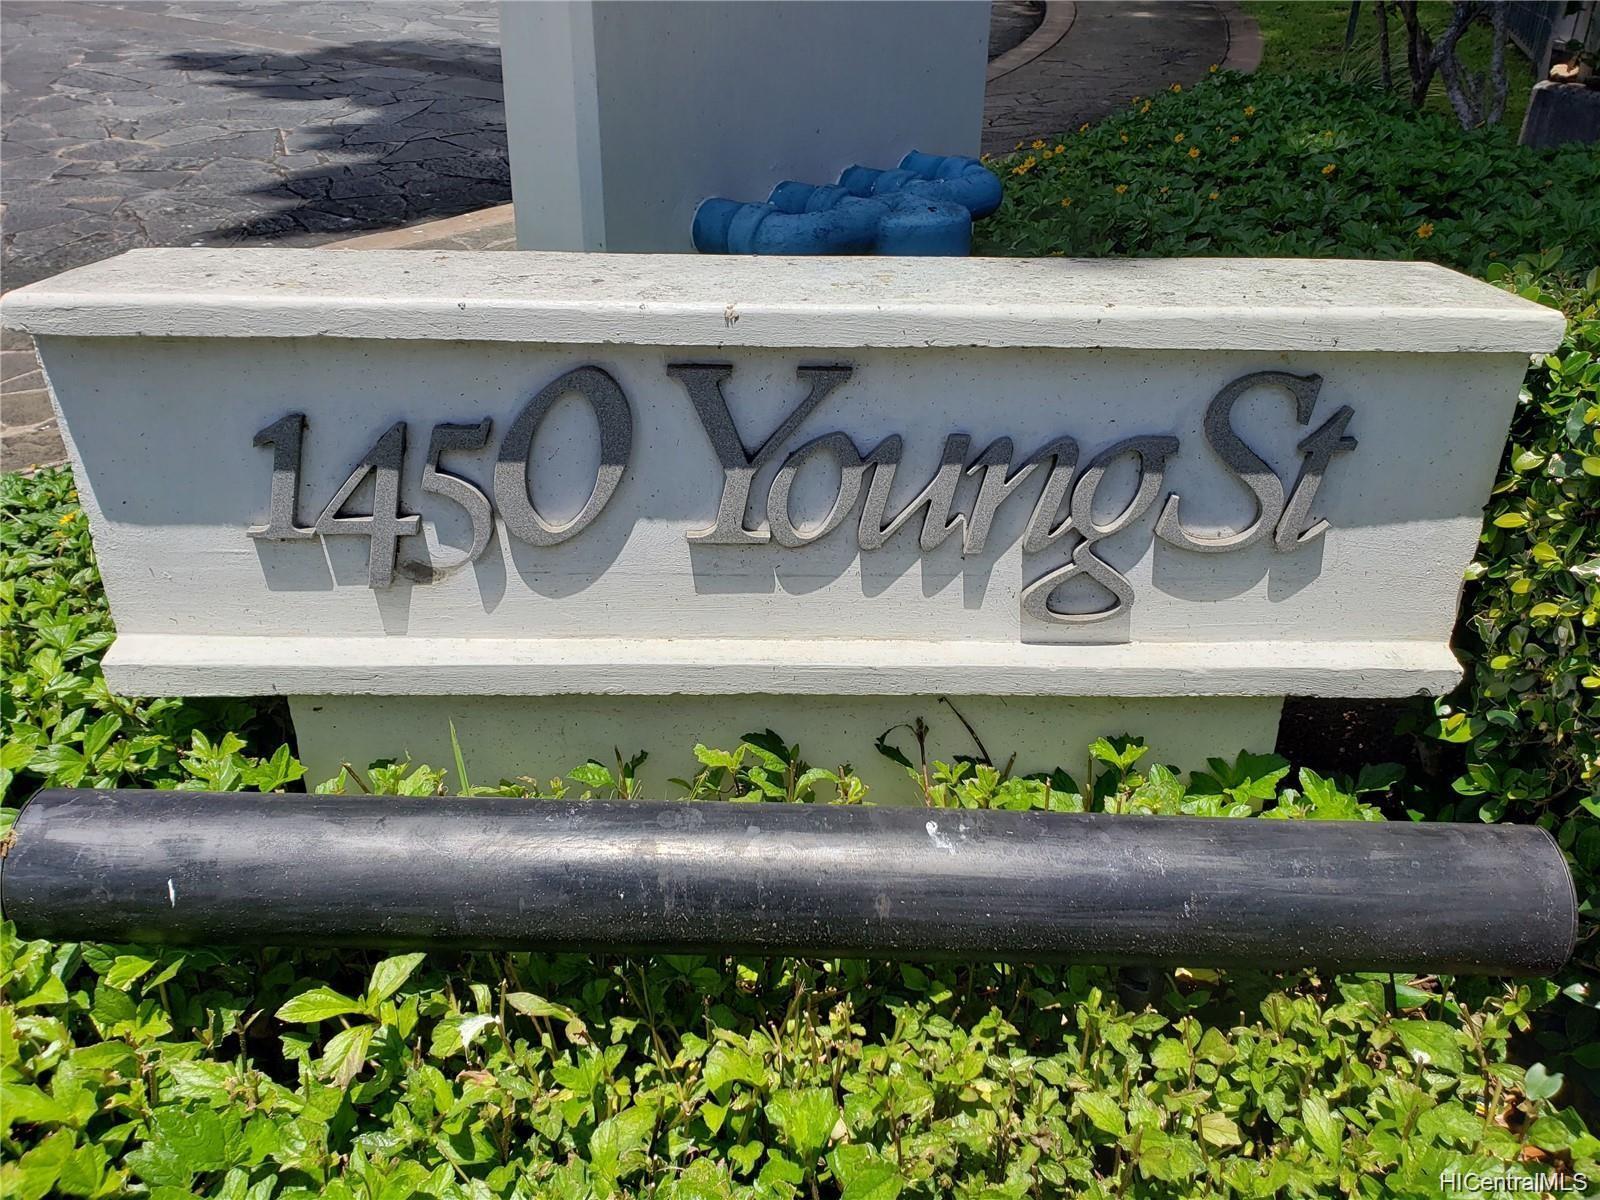 1450 Young St condo # 204, Honolulu, Hawaii - photo 18 of 20